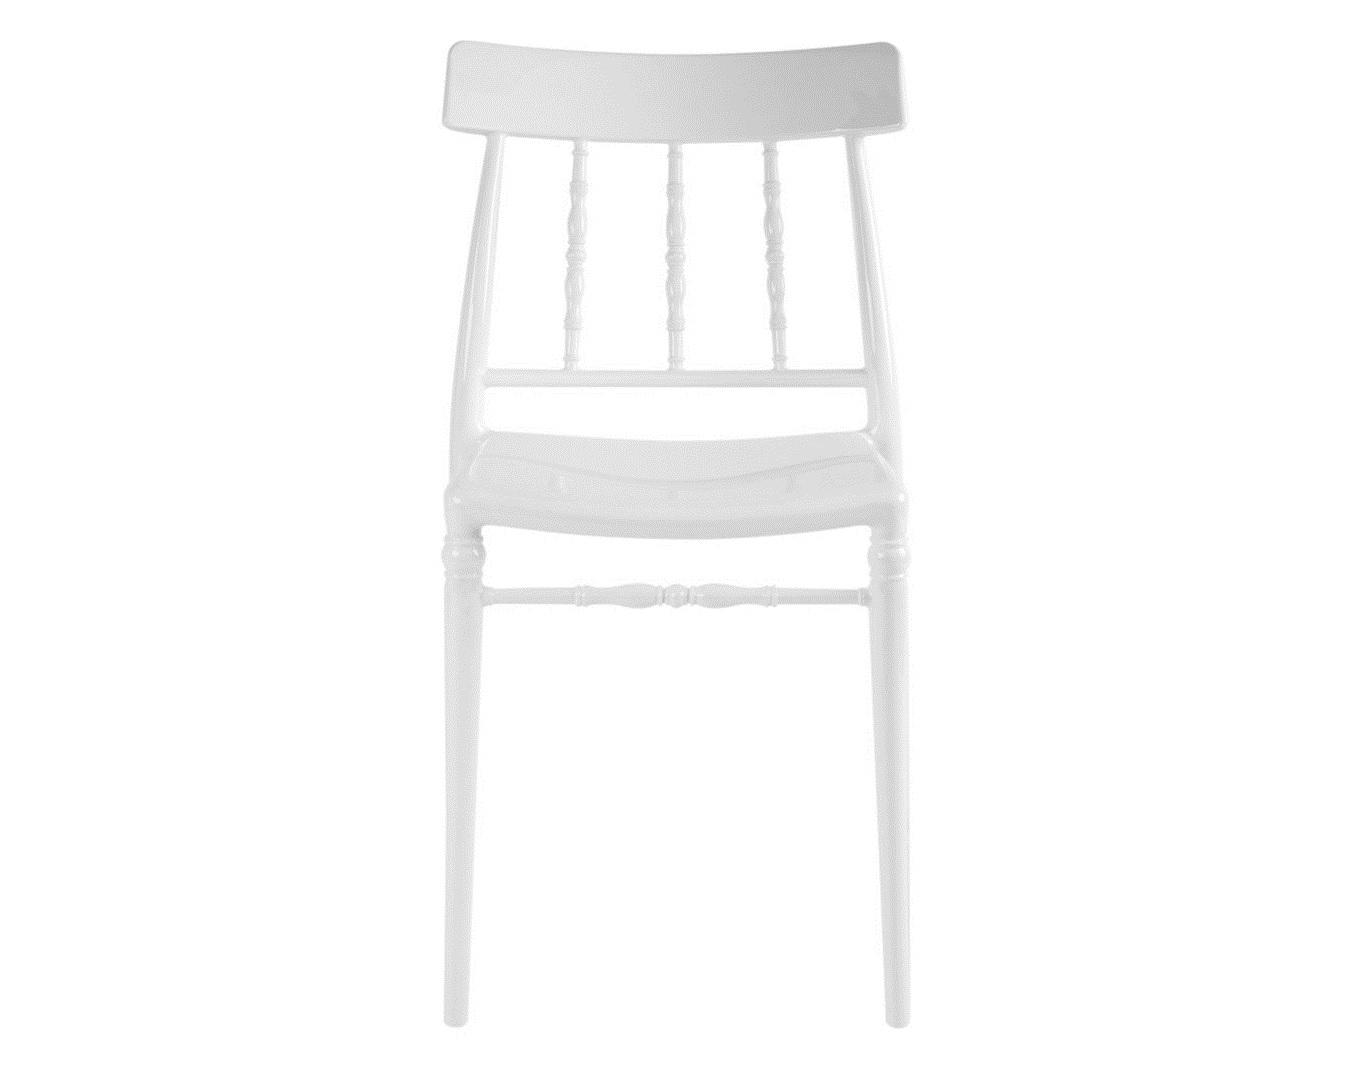 Стул White lacquerОбеденные стулья<br><br><br>Material: Пластик<br>Ширина см: 46<br>Высота см: 84<br>Глубина см: 53